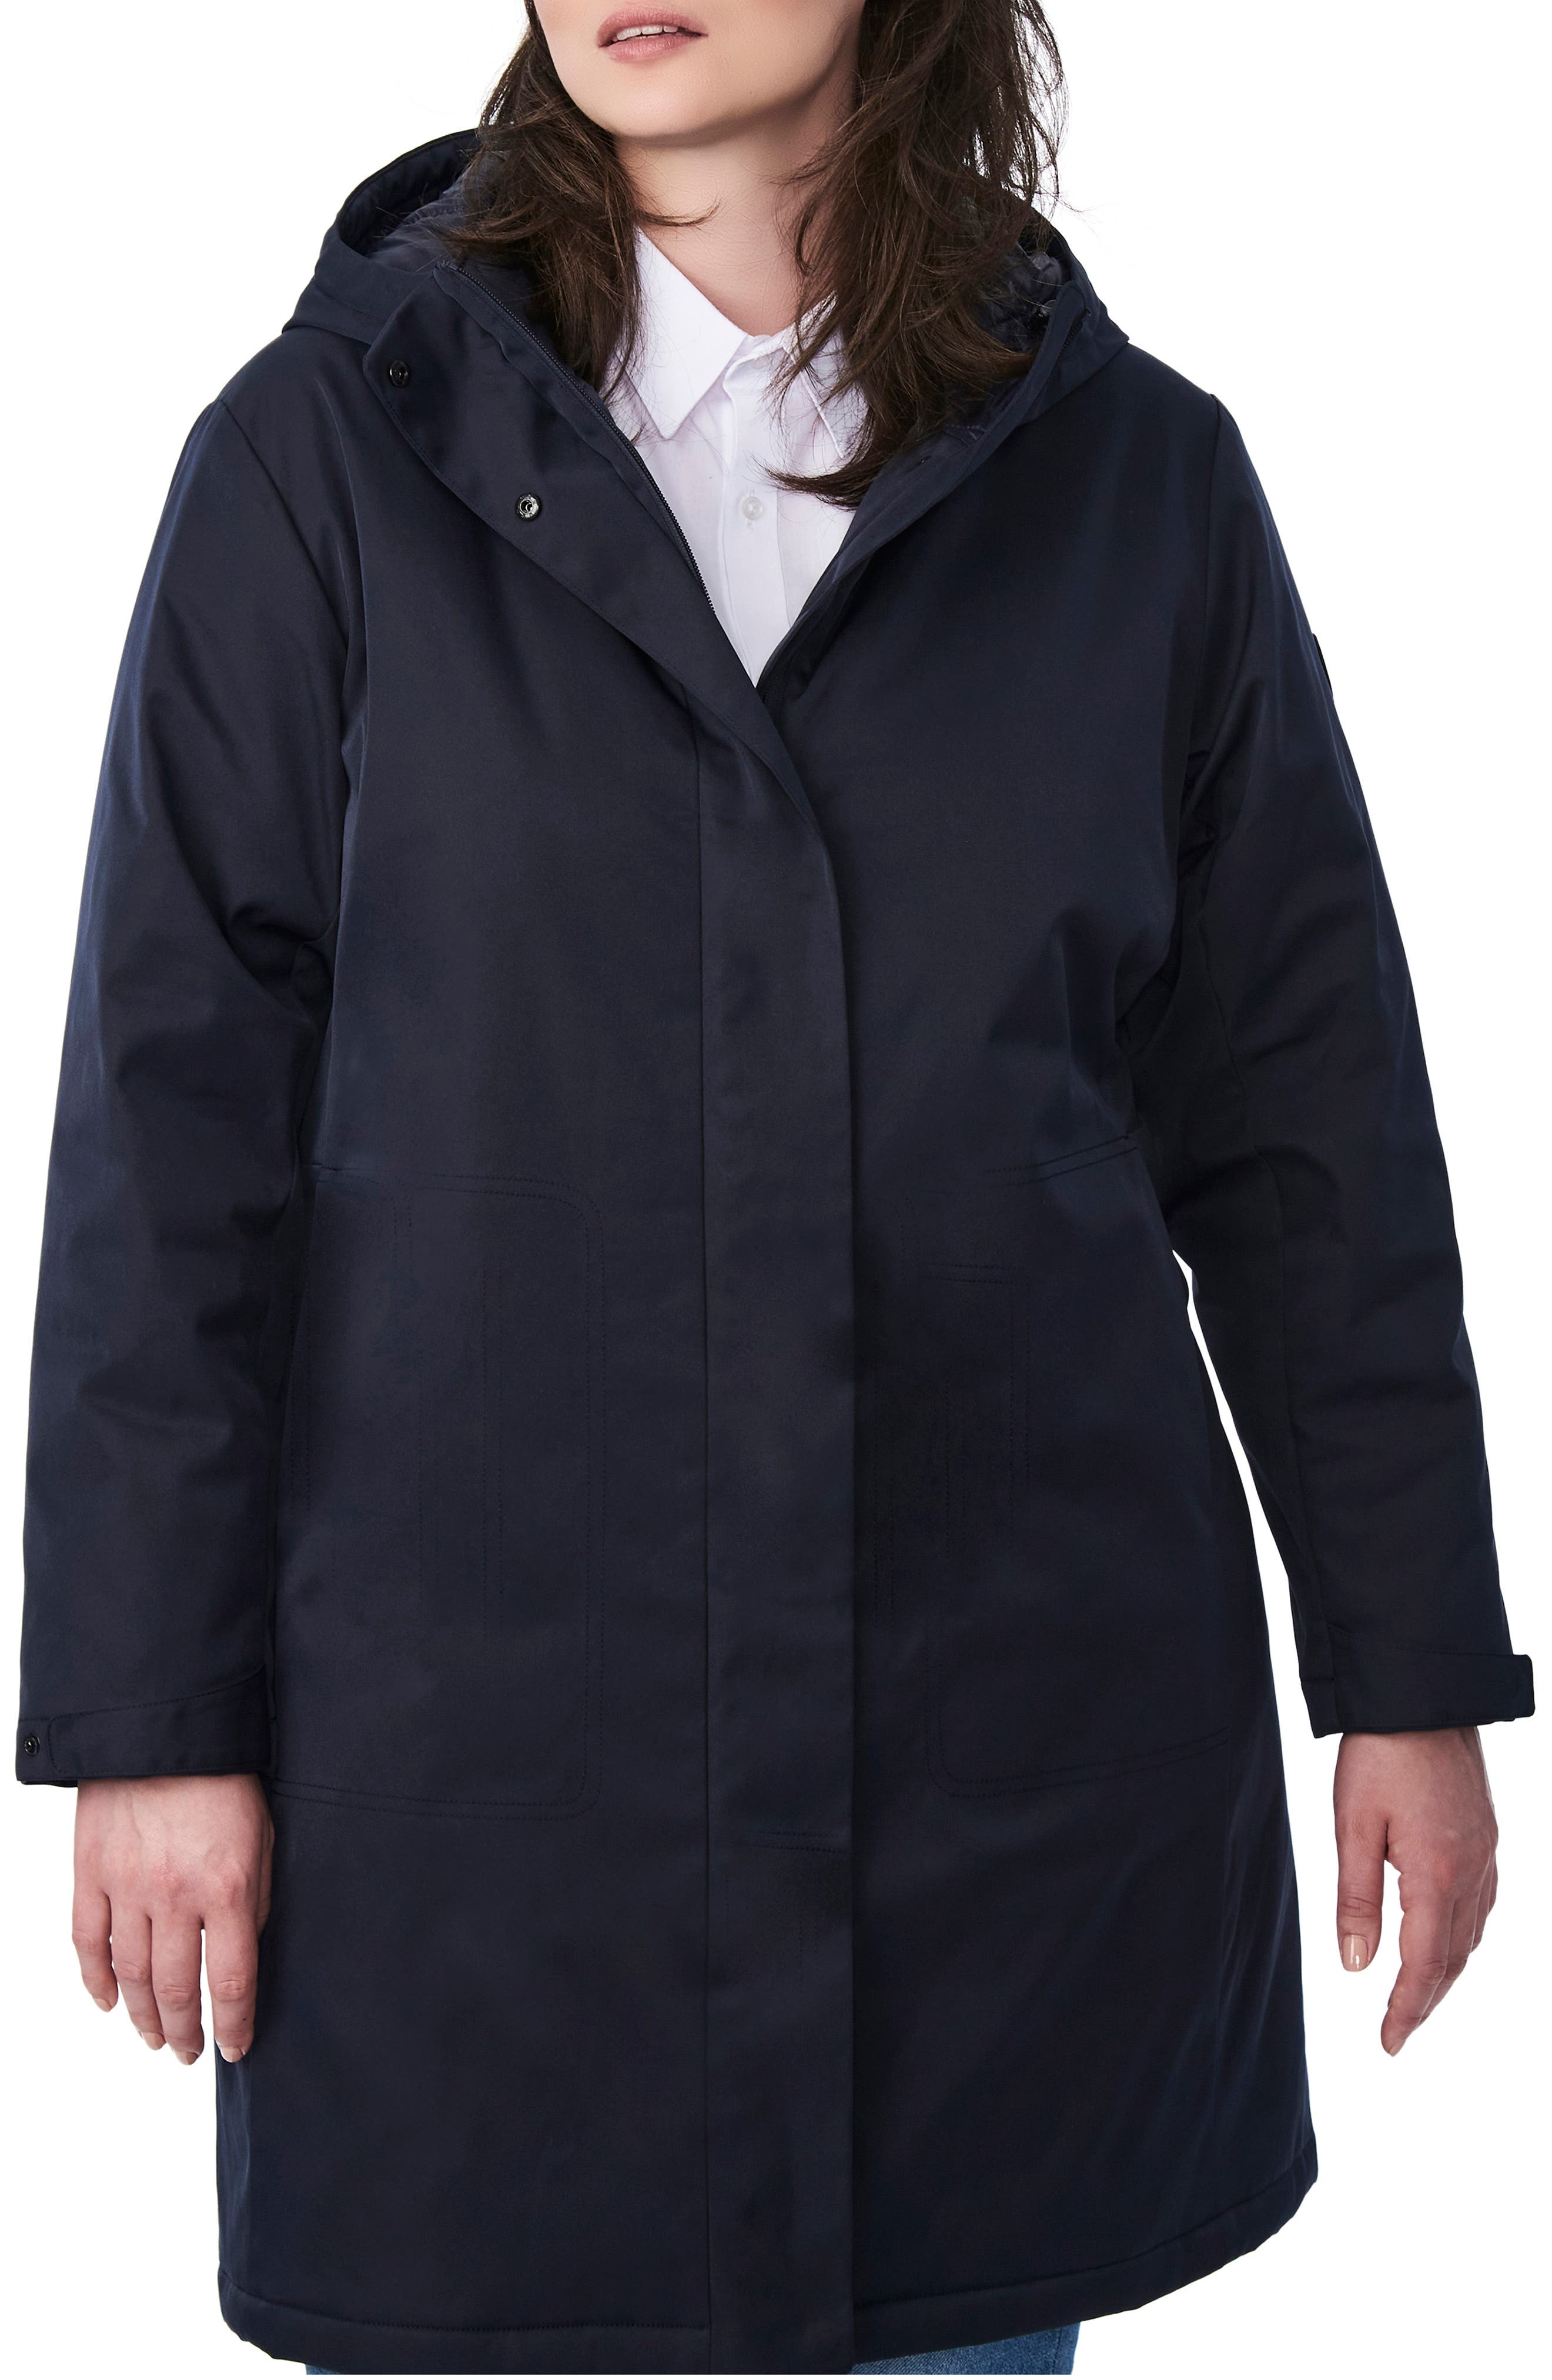 Plus Size Women's Bernado Insulated Hooded Raincoat